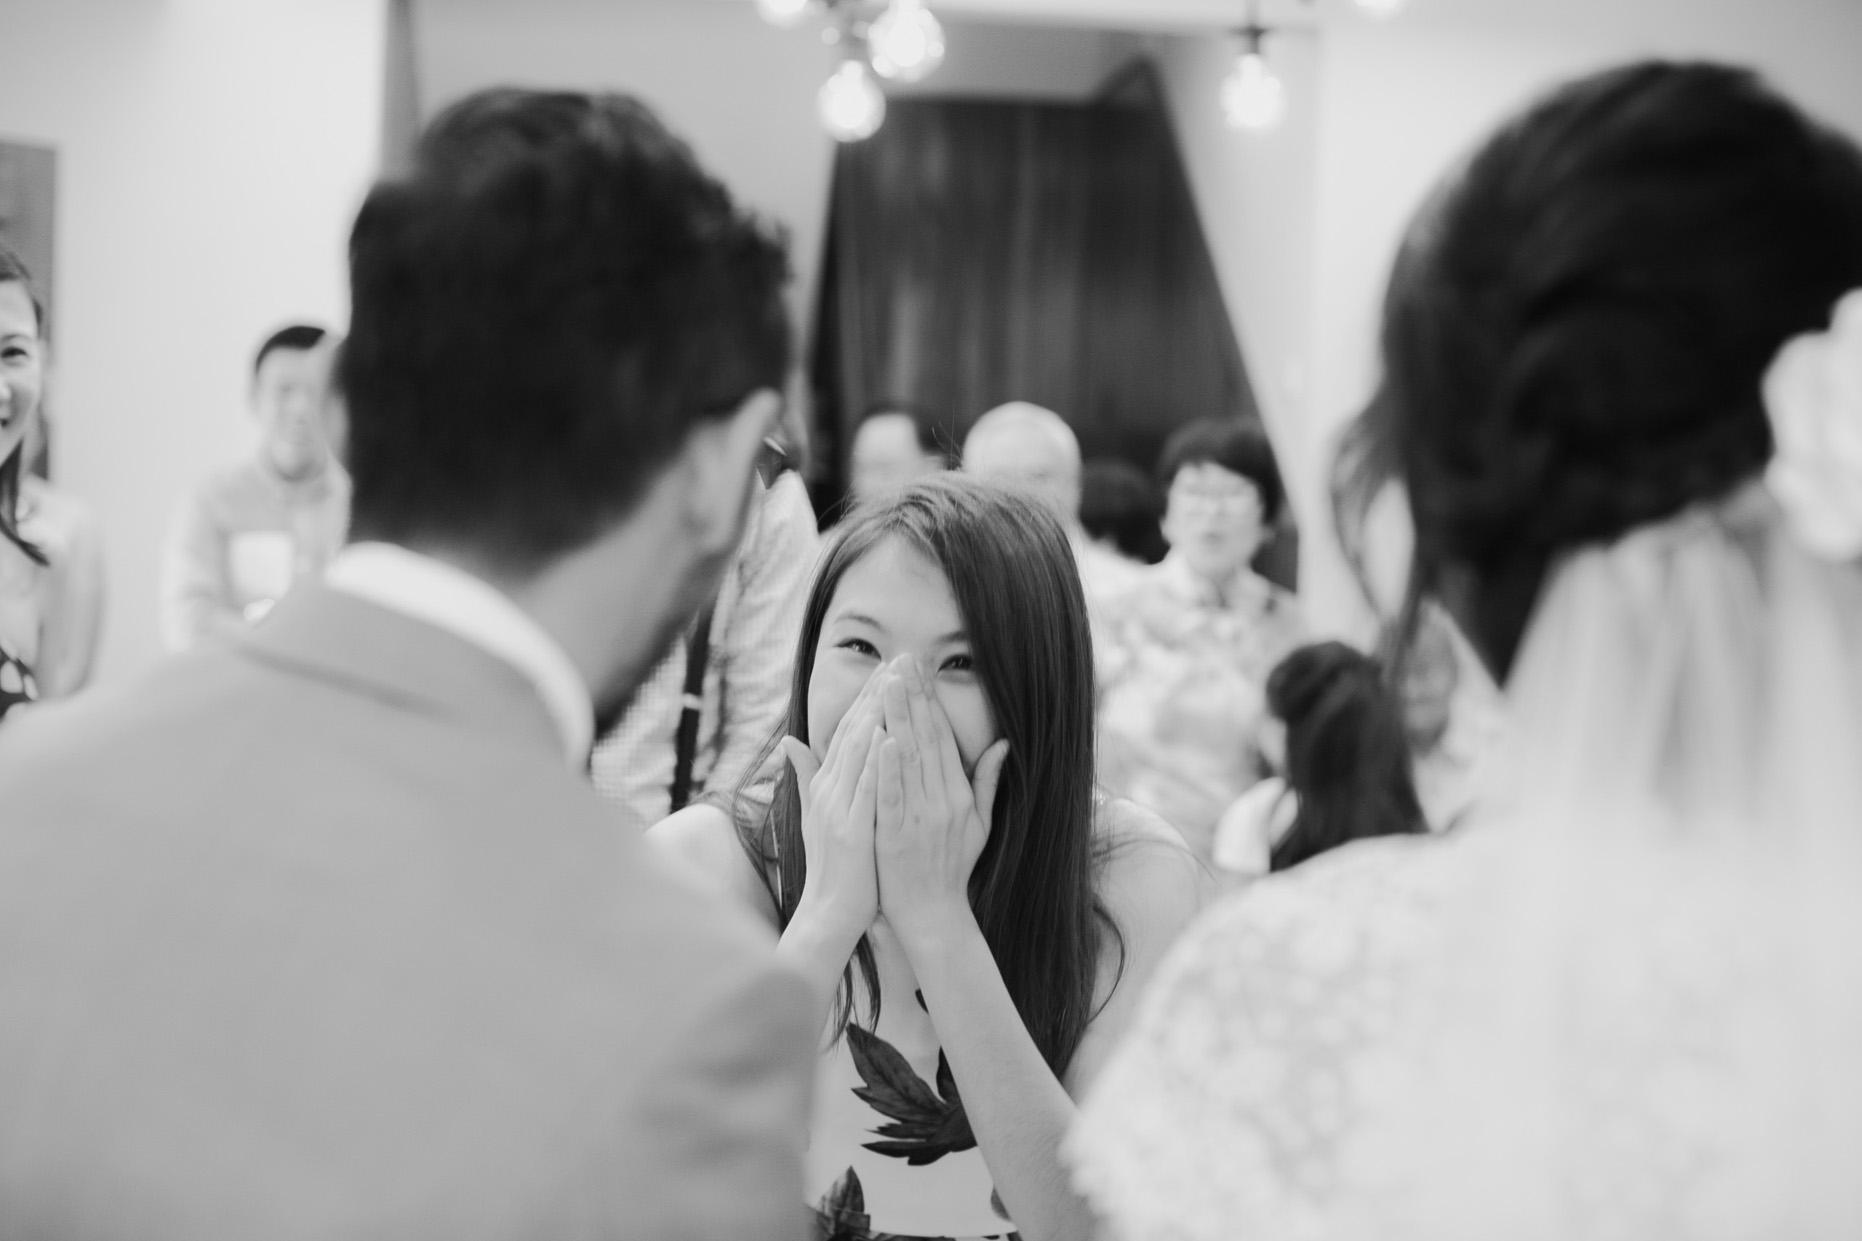 35-hellojanelee-sam grace-malaysia-wedding-day